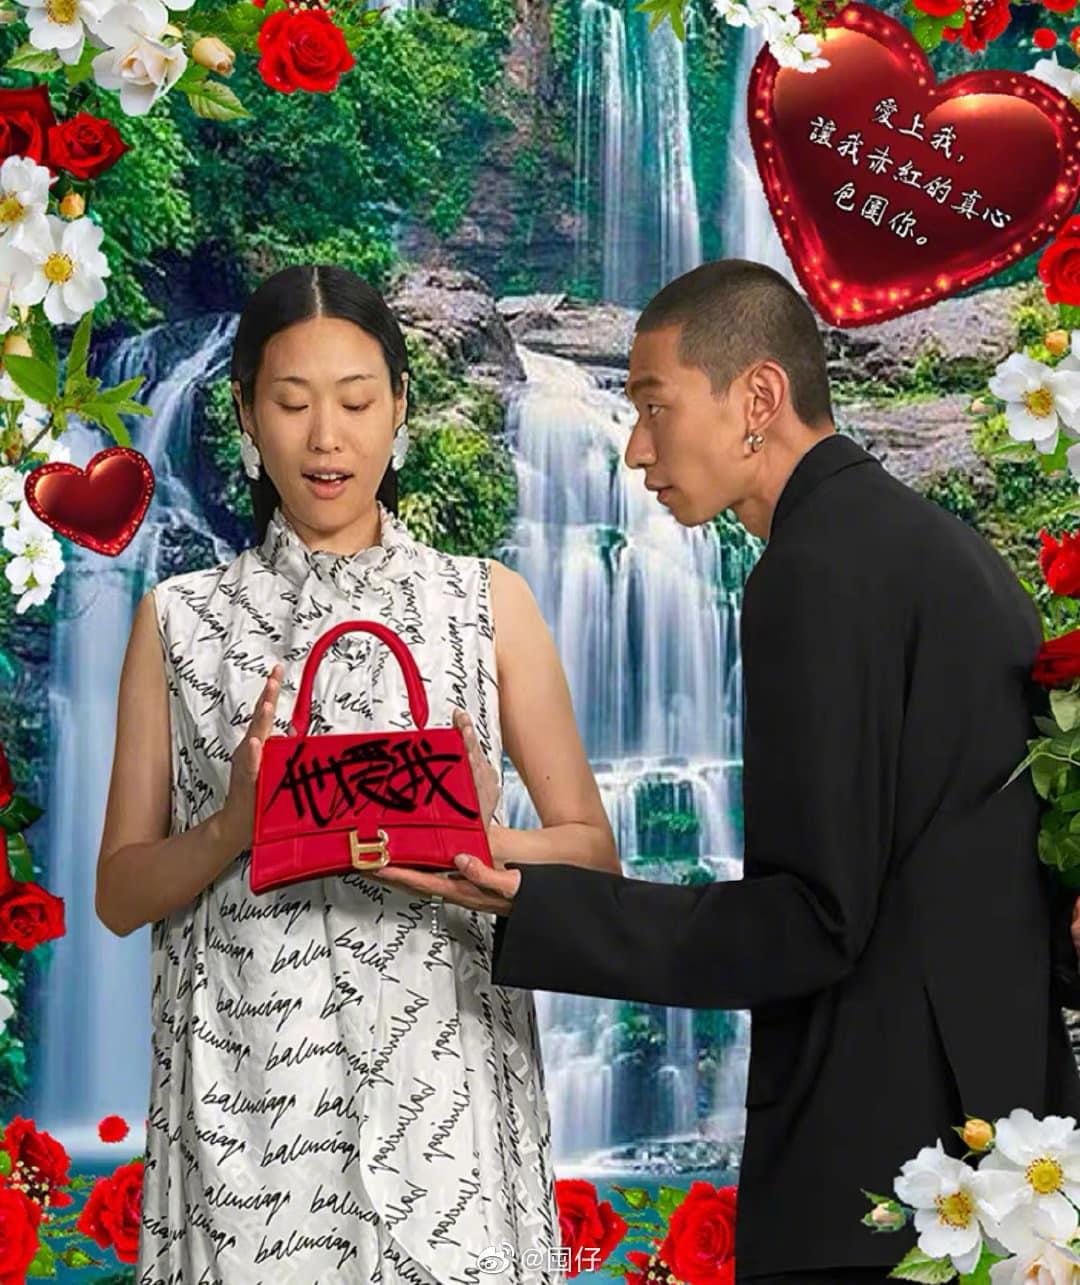 Balancia Chinese Valentine ad campaign